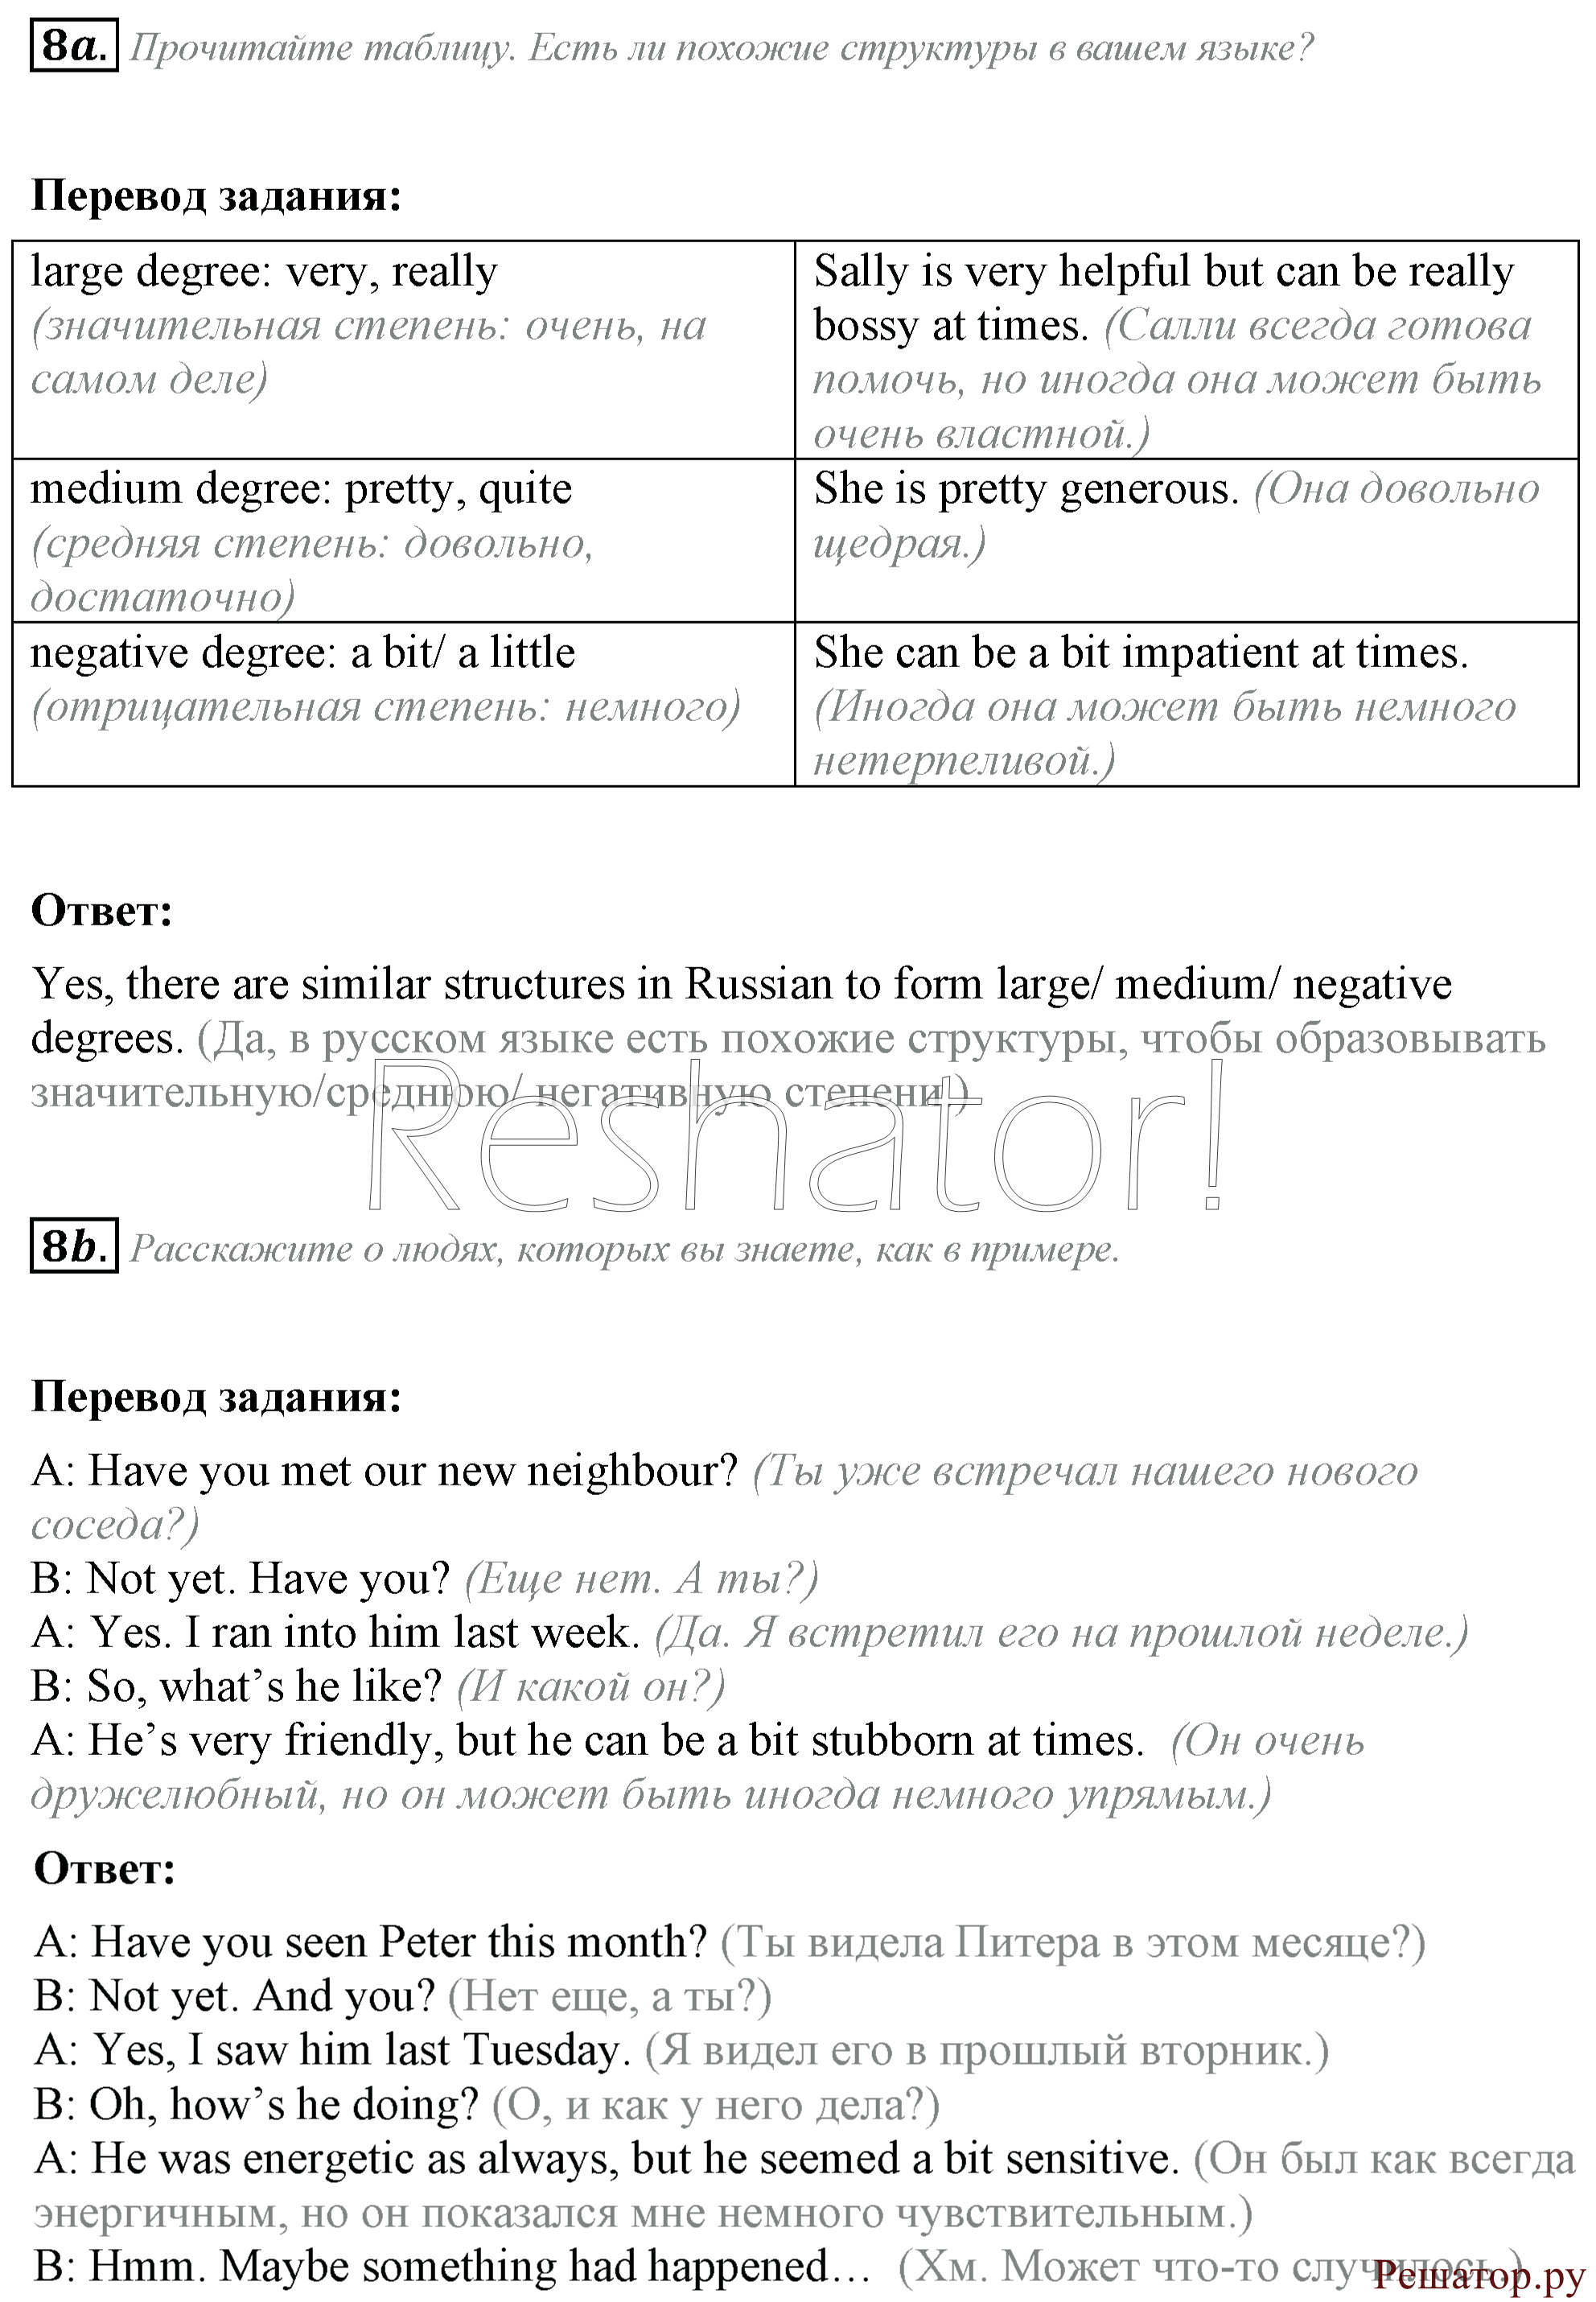 английский язык 8 класс страница 38